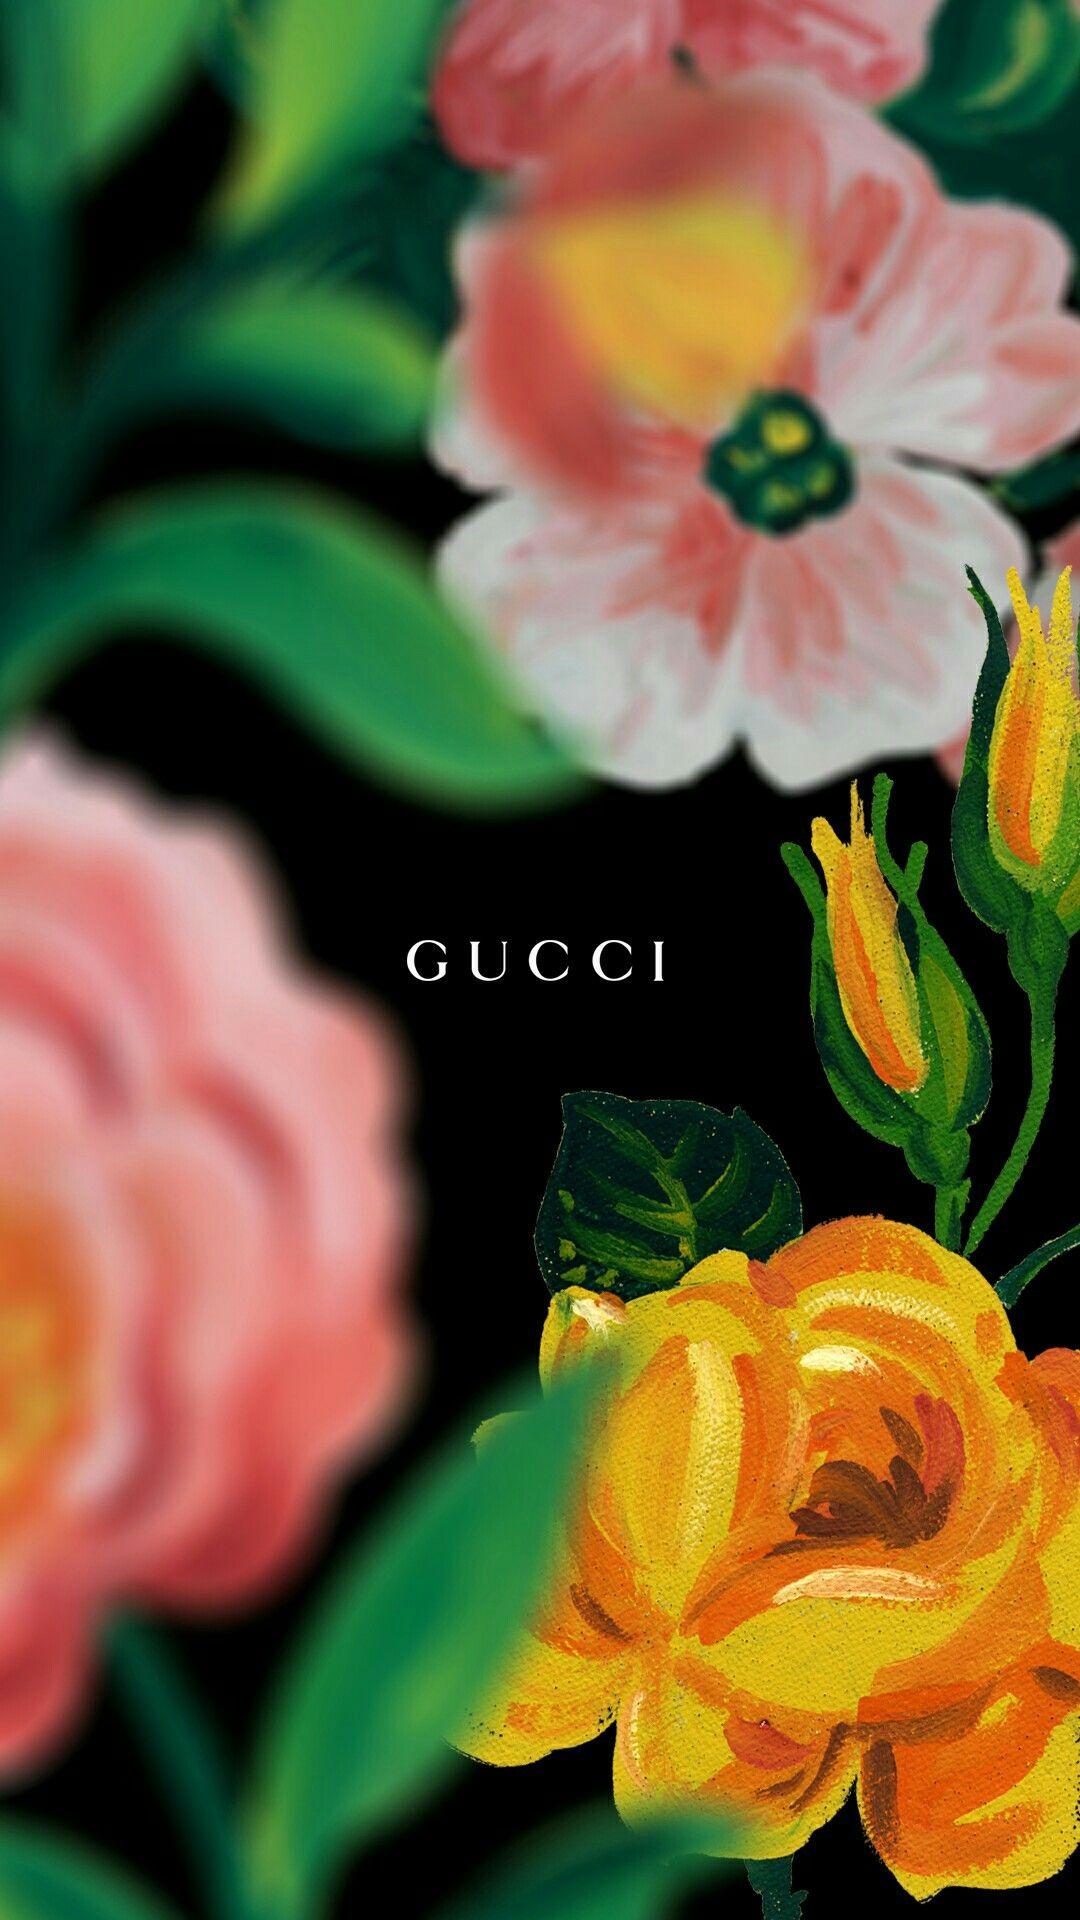 Gucci Iphone Wallpaper Pinterest Larissaagbor Gucci Wallpaper Iphone Iphone 7 Wallpapers Iphone Wallpaper